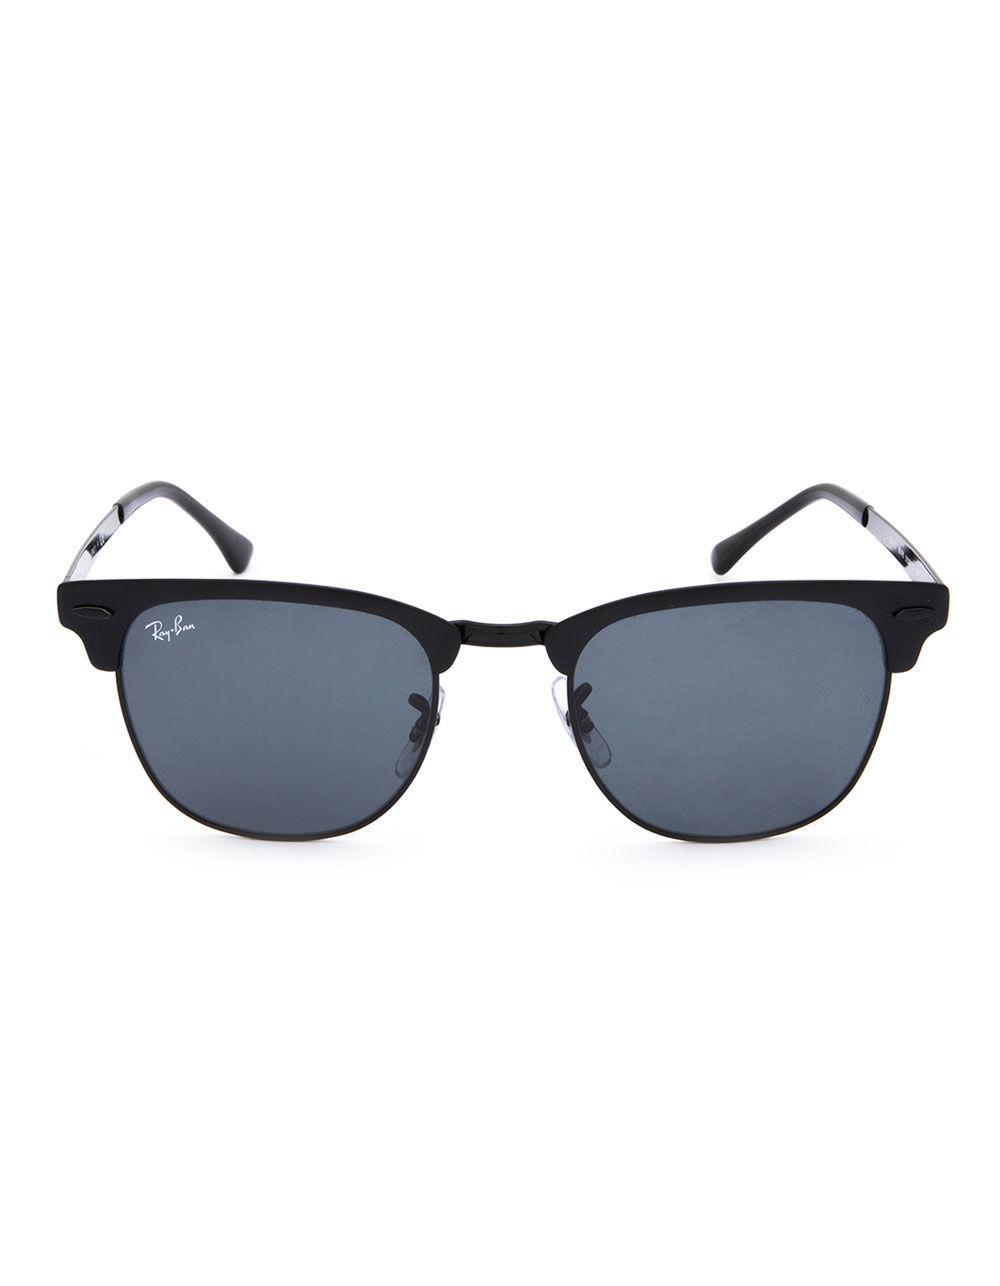 7befba6630 Lyst - Ray-Ban Clubmaster Metal Black   Blue Gradient Sunglasses in Black